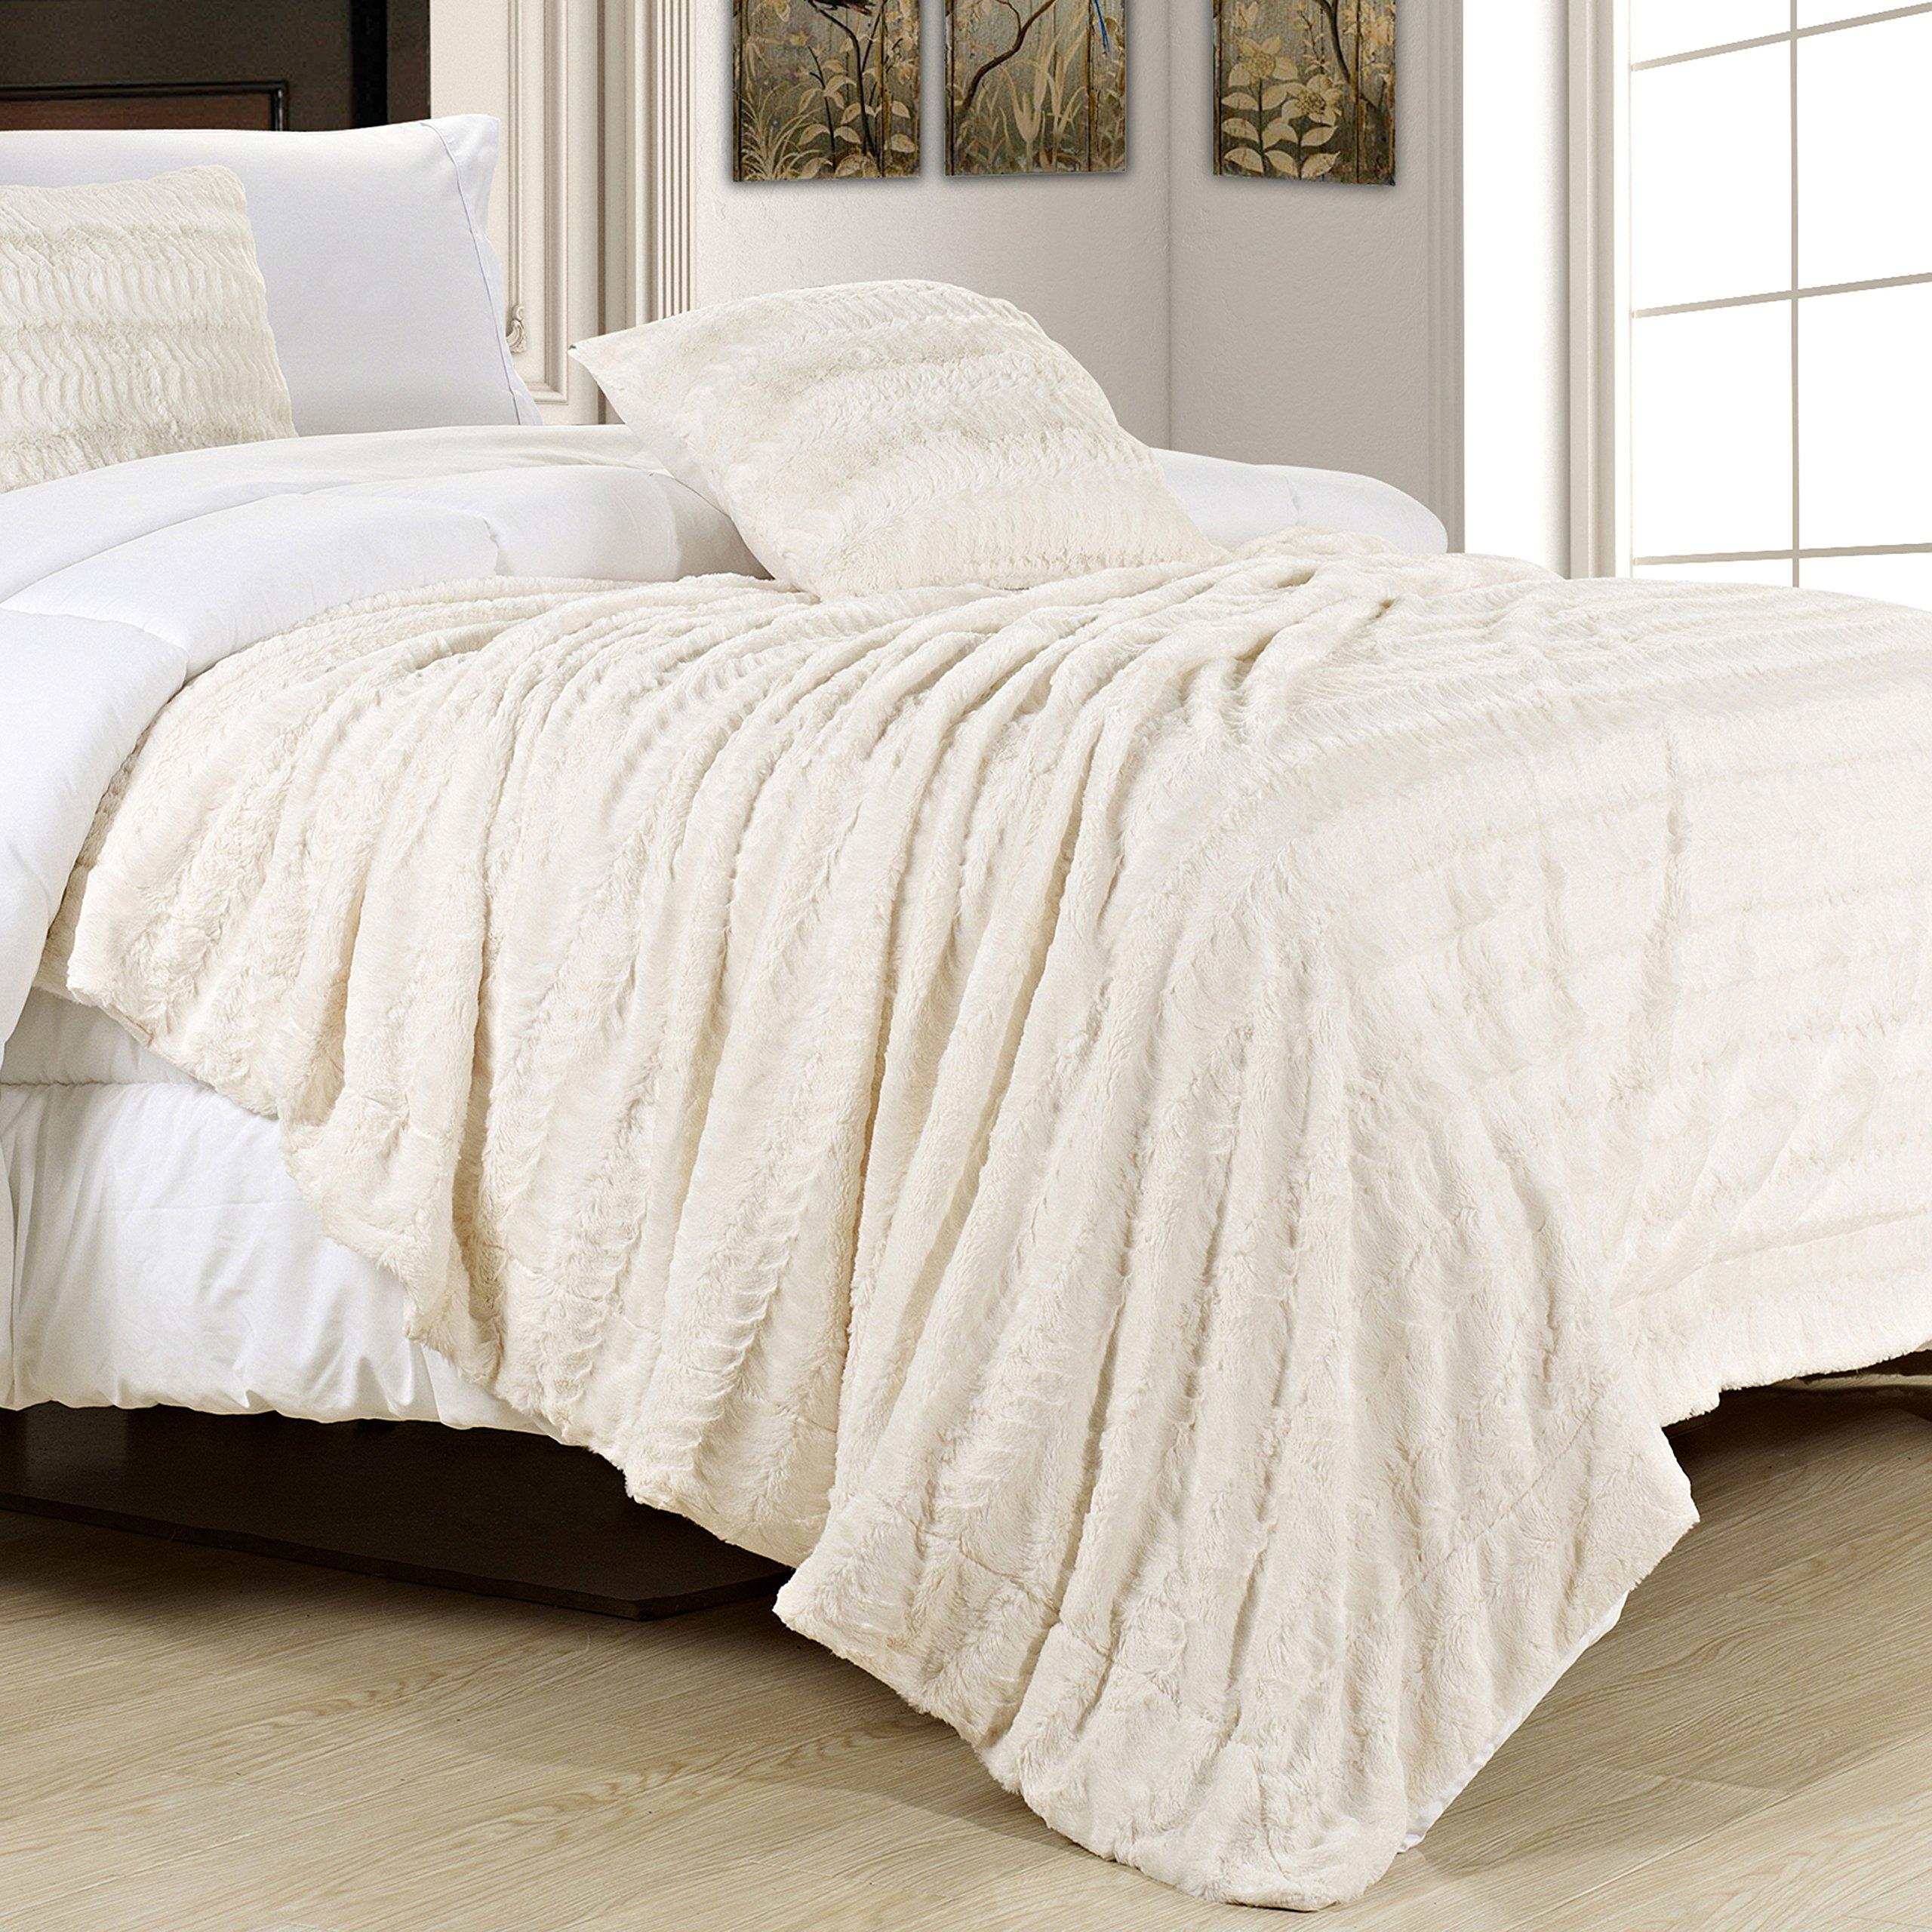 decor shop default history ethanallen lr ivory alt bedding throws s book fur pillows bed faux throw flip